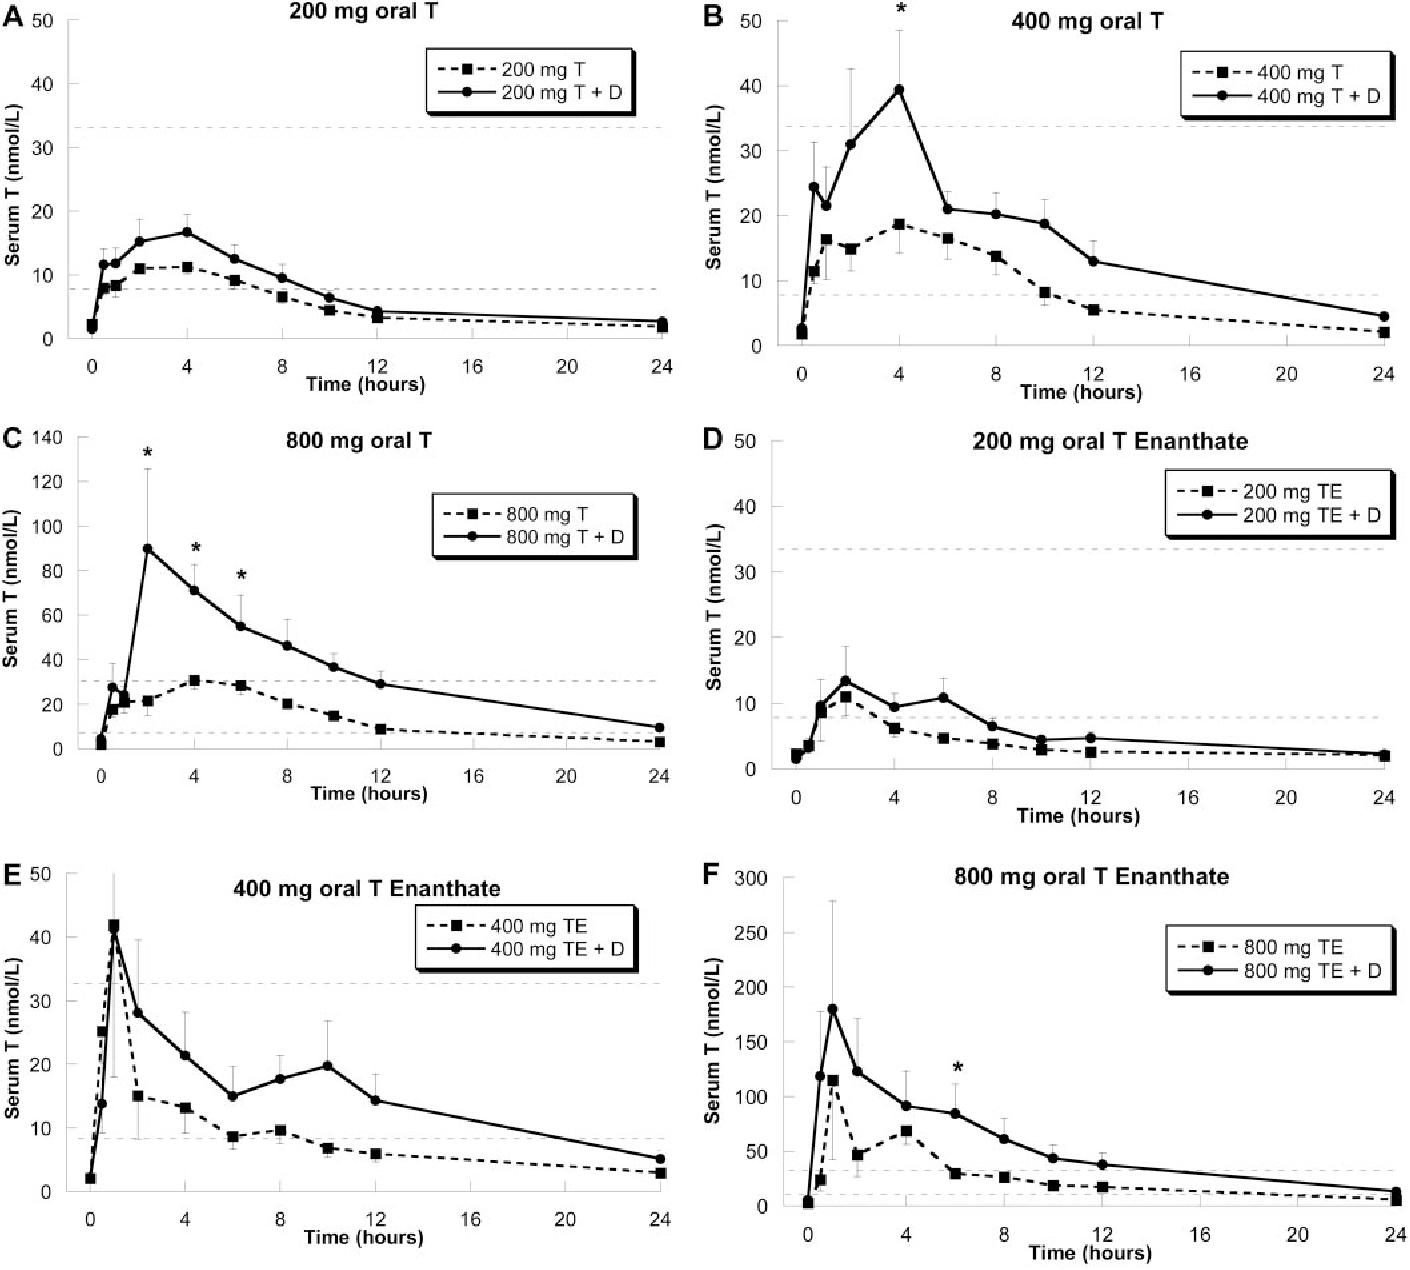 Pdf Oral Testosterone In Oil Plus Dutasteride In Men A Pharmacokinetic Study Semantic Scholar